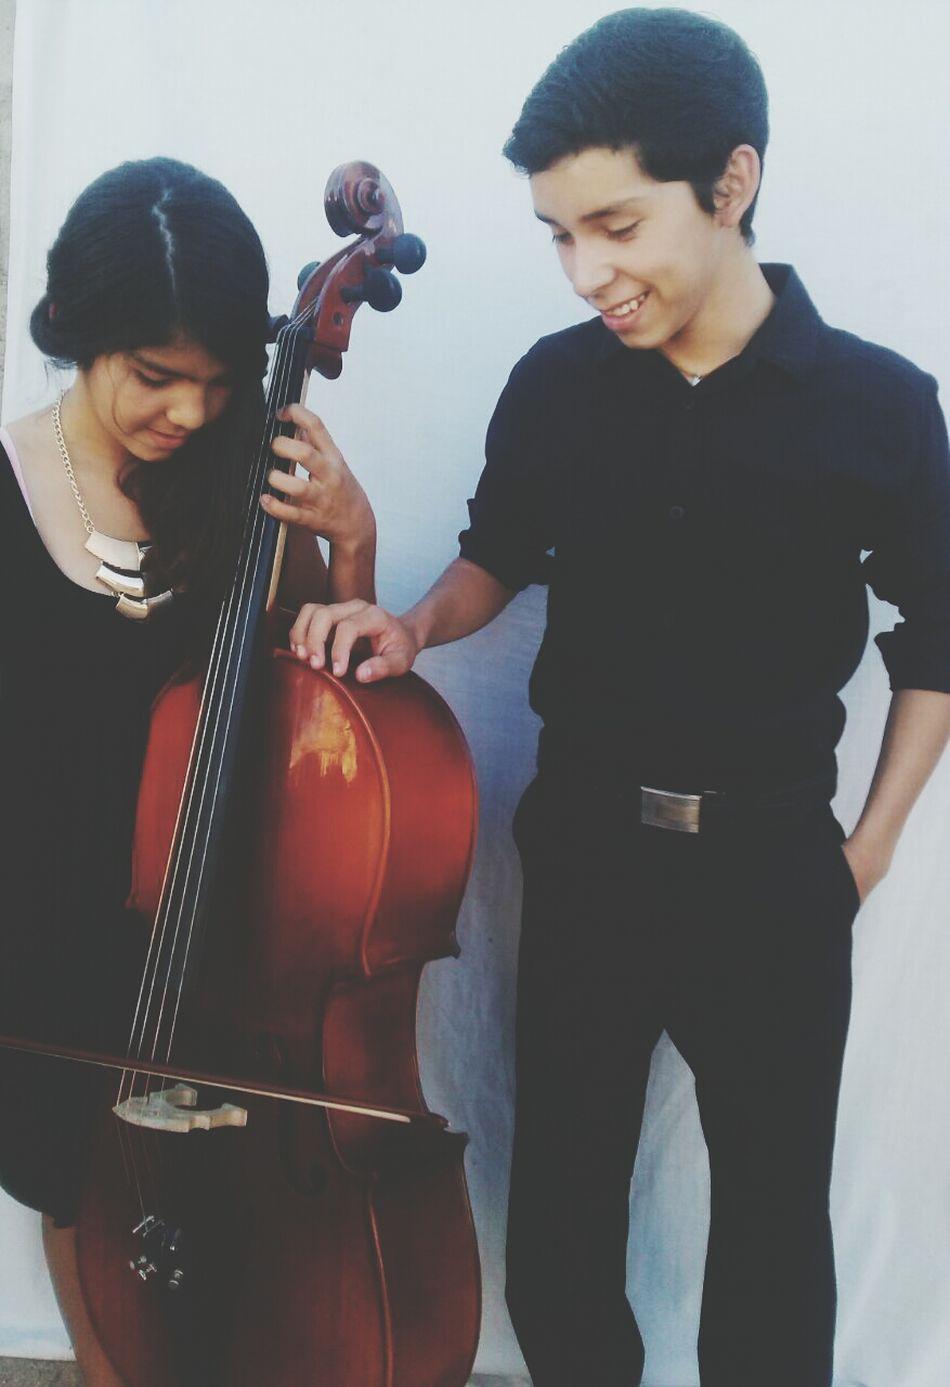 Fiestasdelpitic2015 Musicajovendelpitic Contrabass Cello